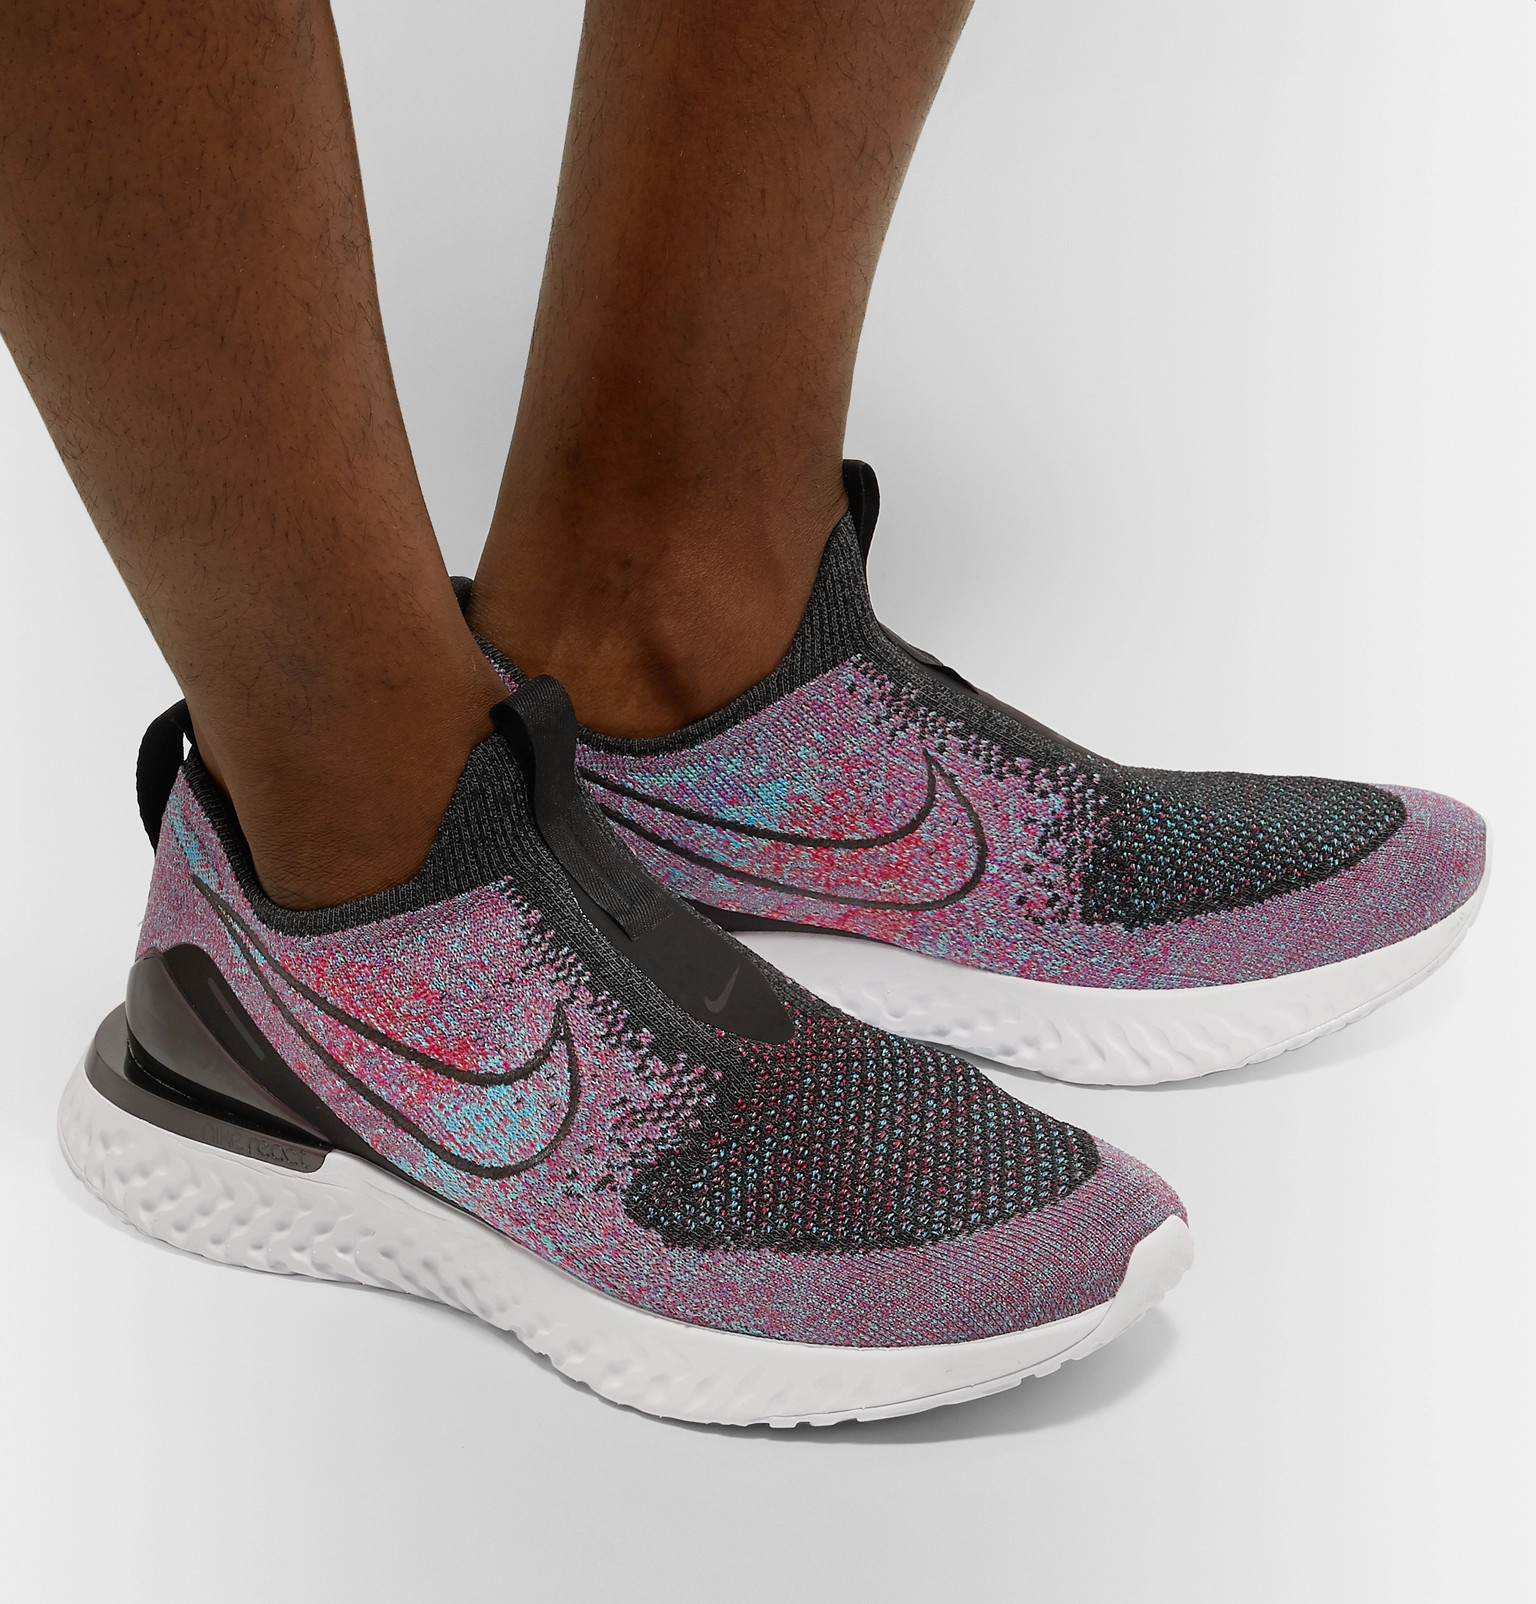 212d62a78946a Nike Running - Epic Phantom React Flyknit Slip-On Running Sneakers